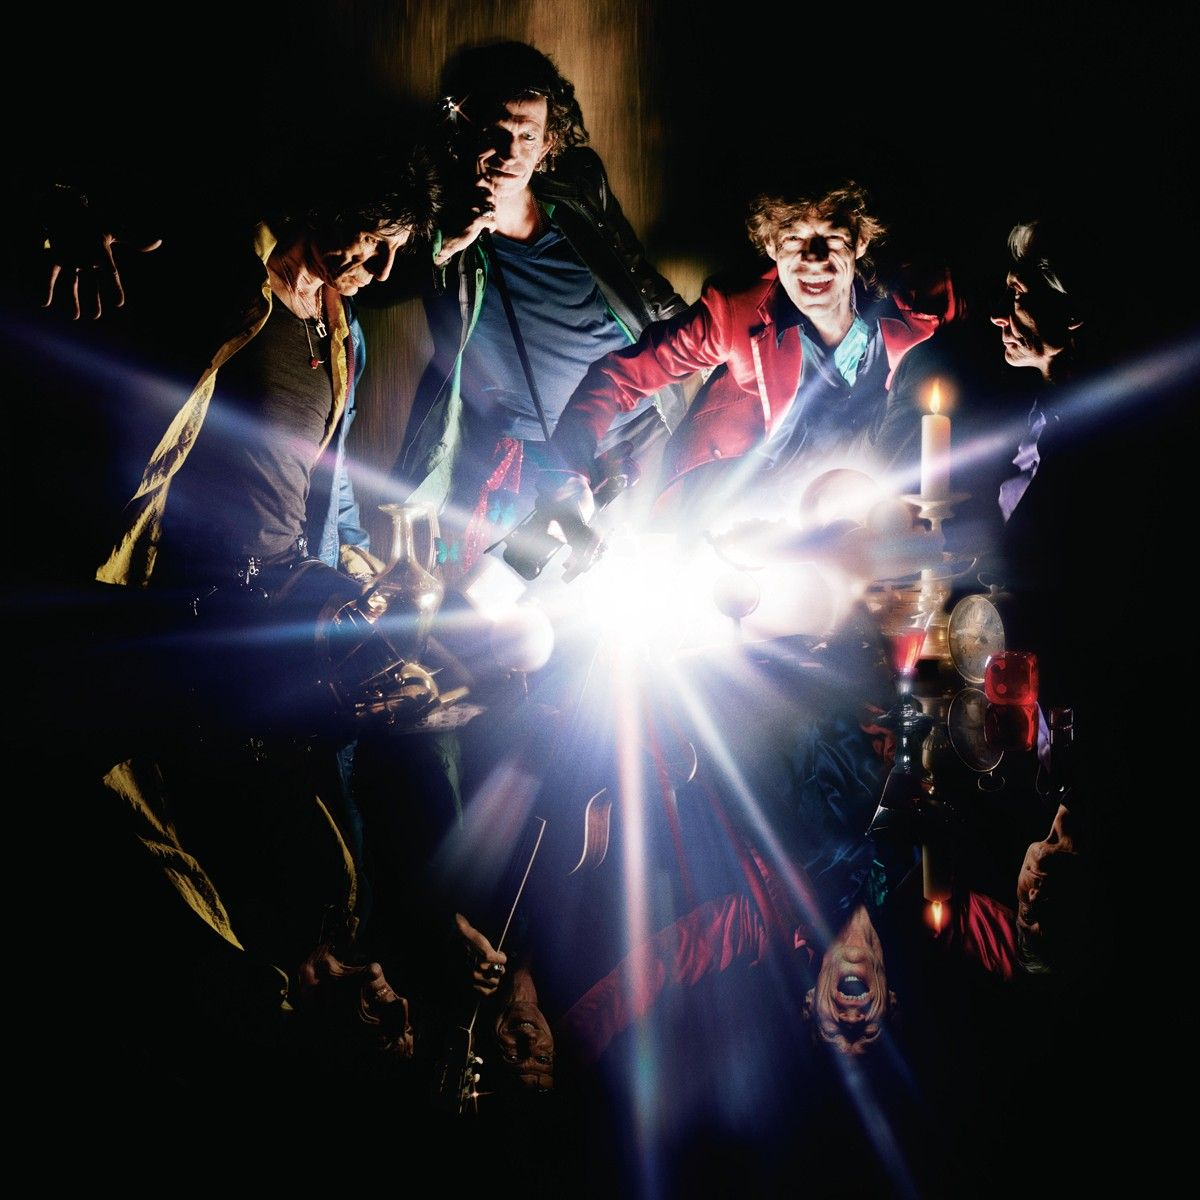 The Rolling Stones - A Bigger Bang album cover